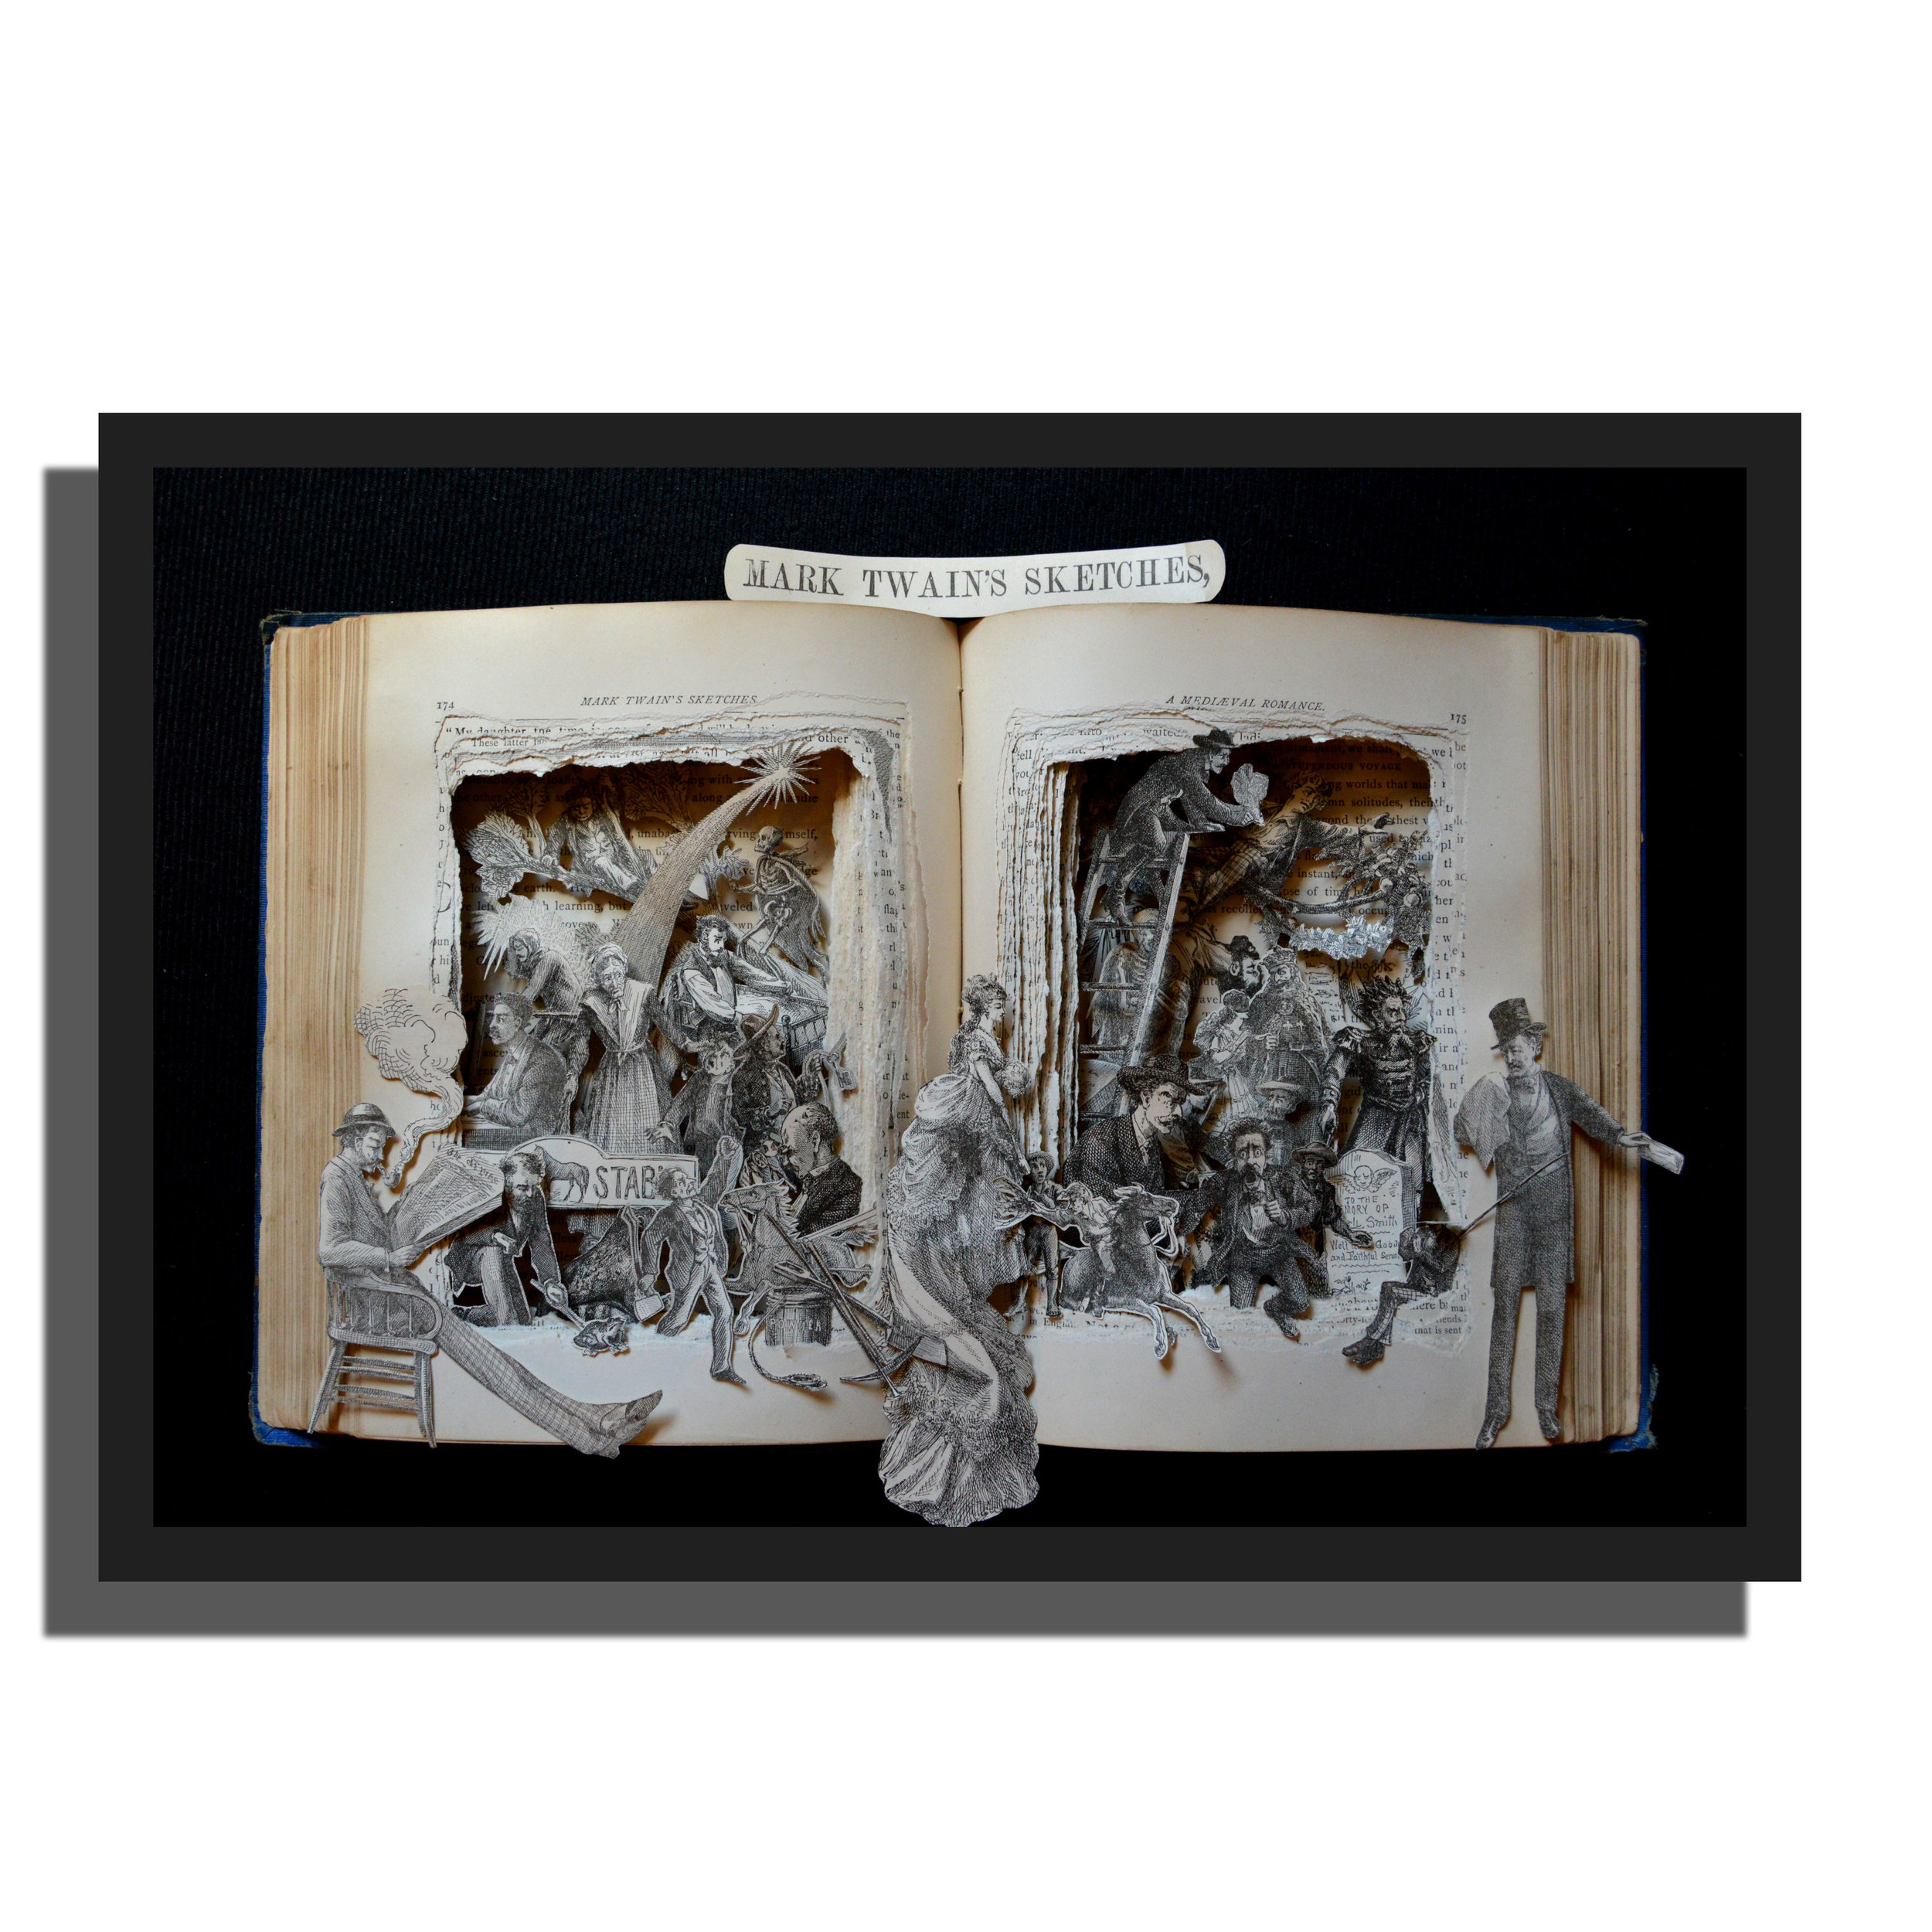 12x16x3 Mark Twain Sketches - First Edition